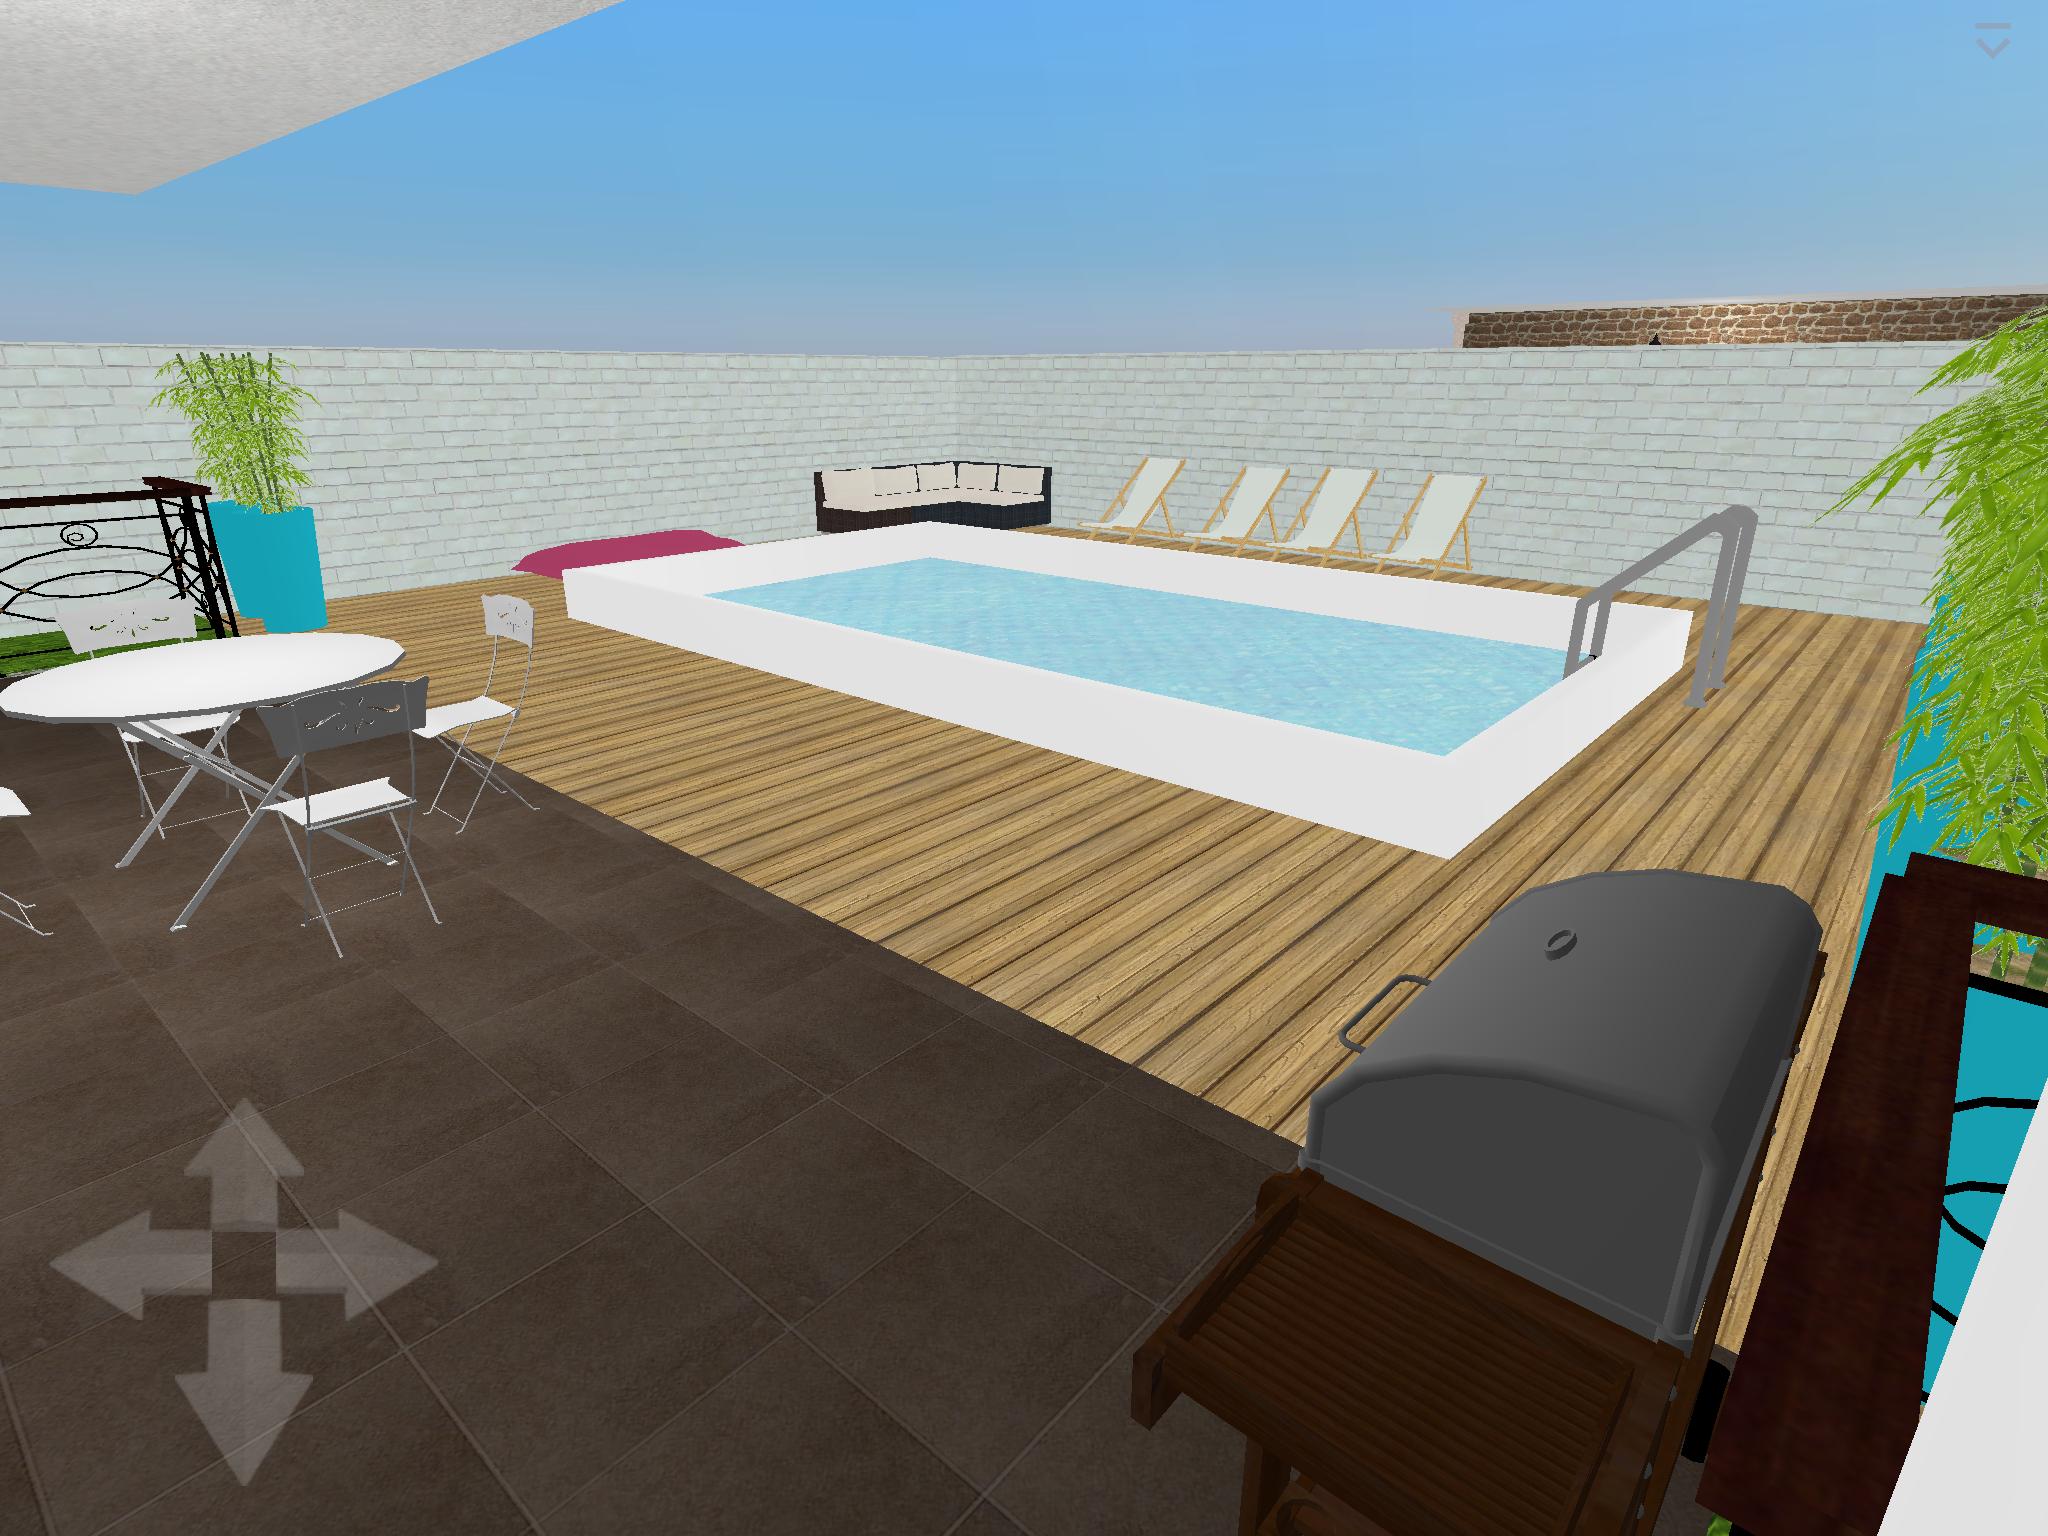 logiciel terrasse logiciel terrasse jardin gratuit versailles lampe photo galerie logiciel. Black Bedroom Furniture Sets. Home Design Ideas